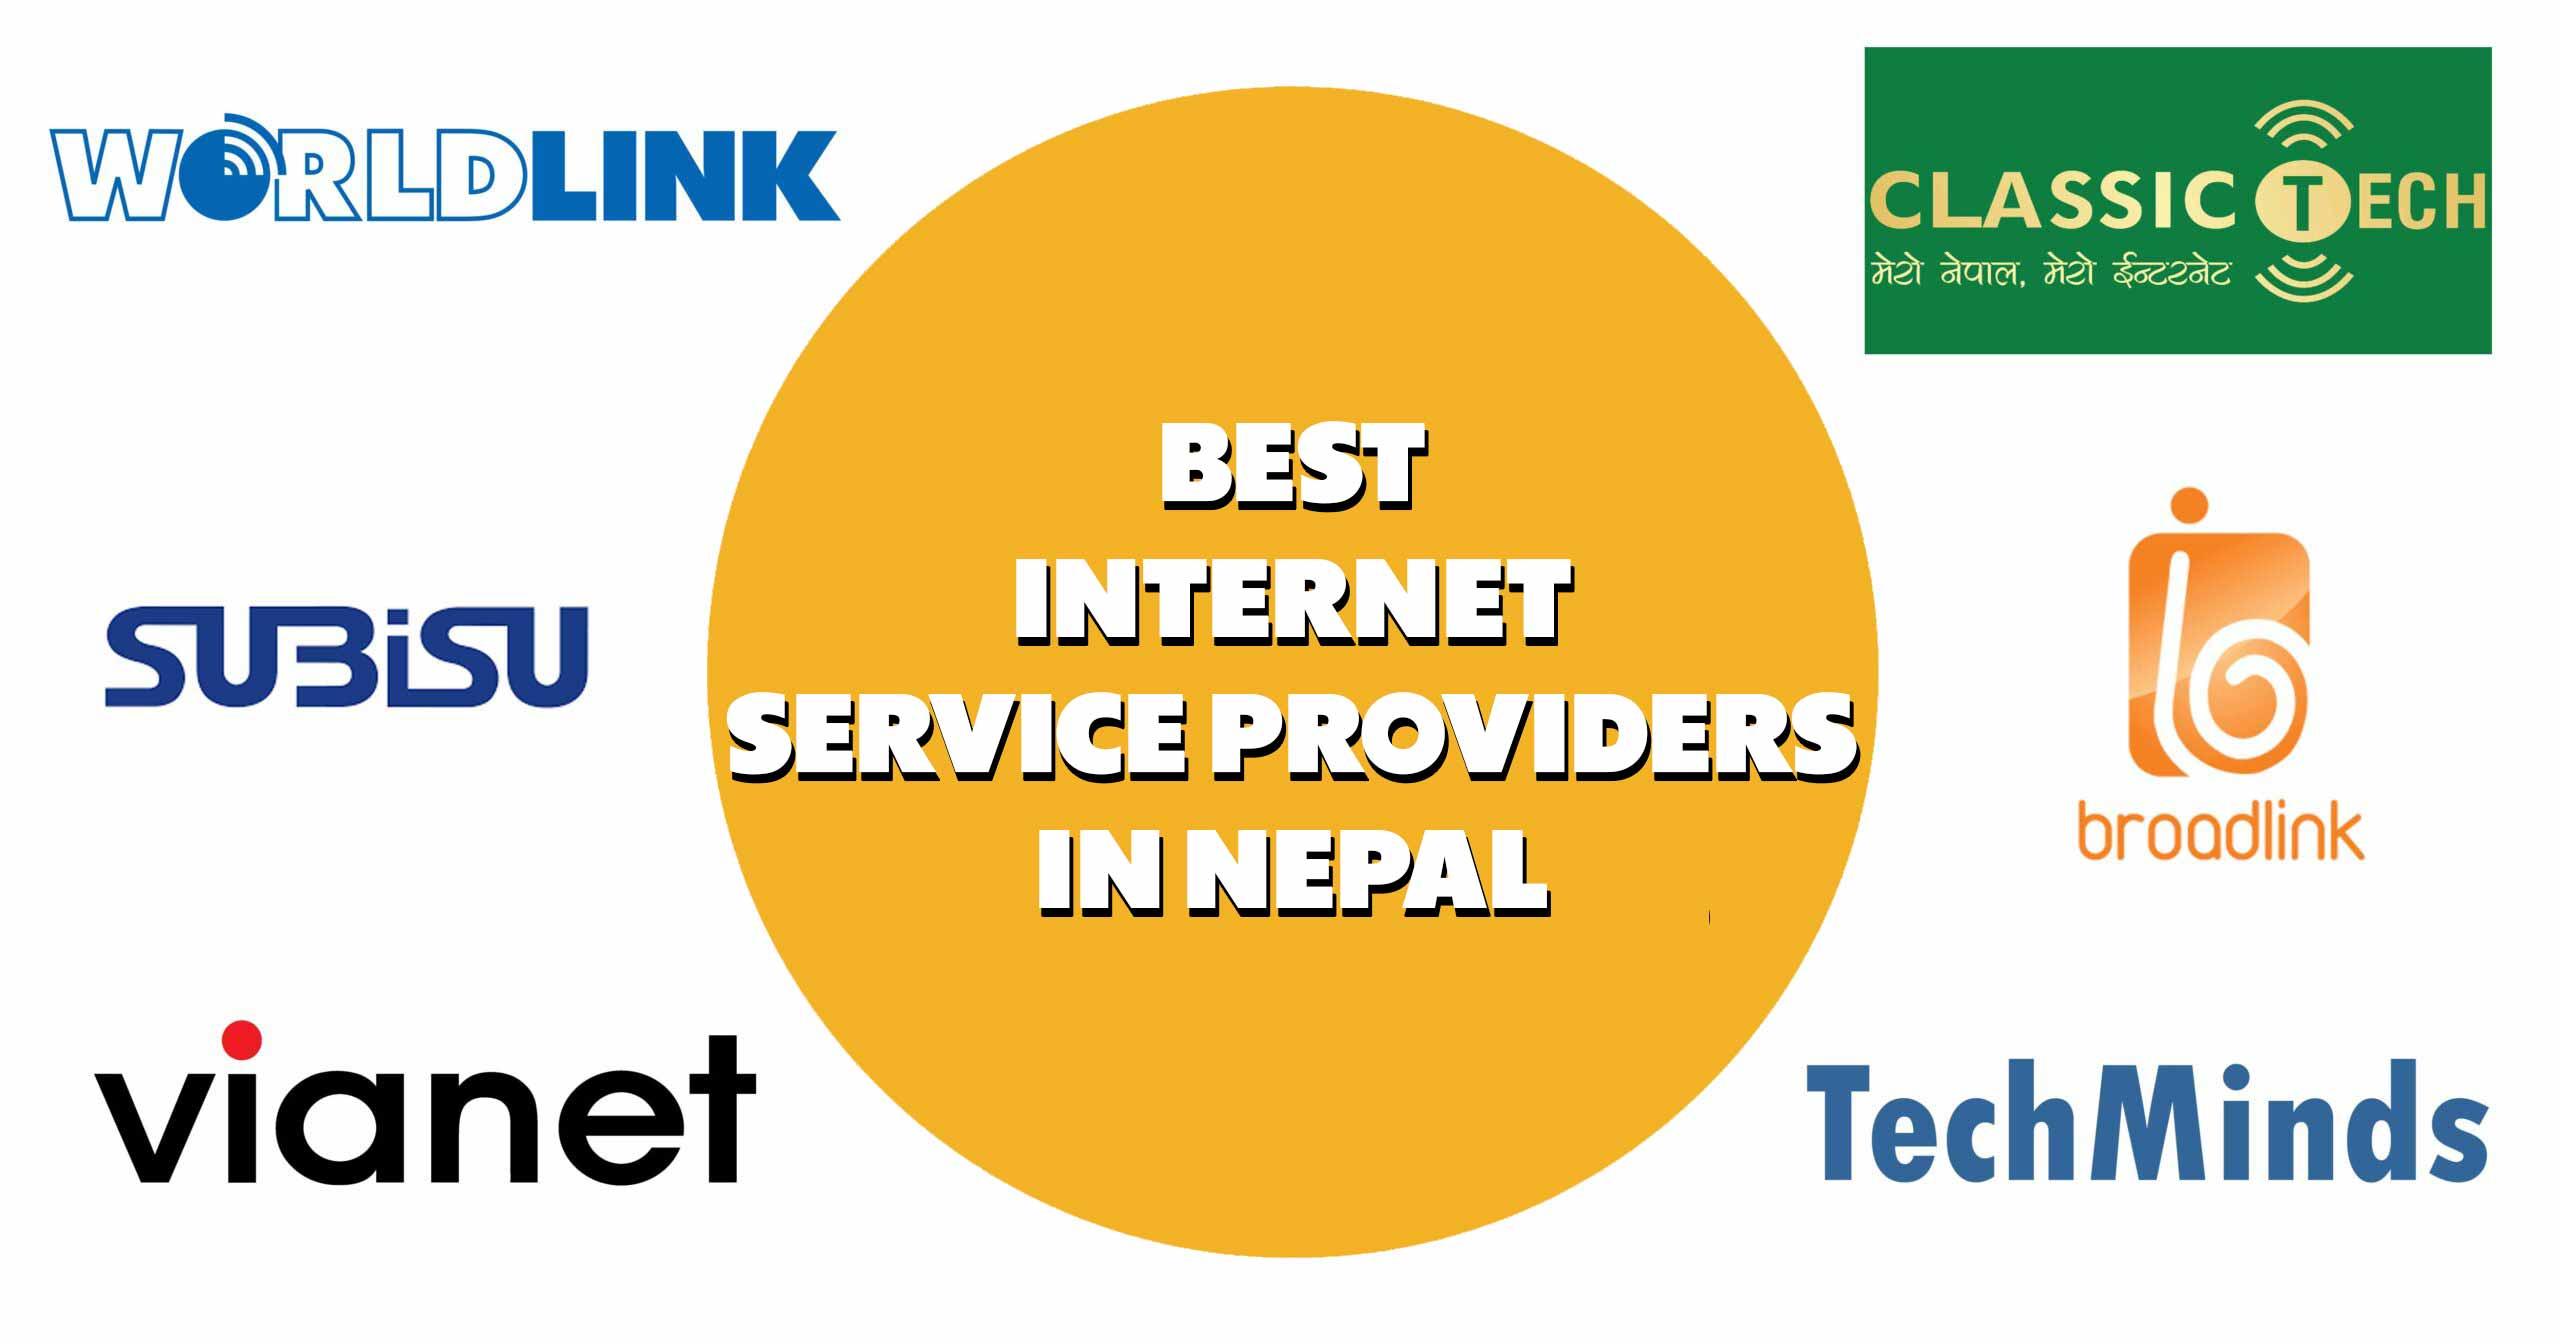 best internet service providers in Nepal